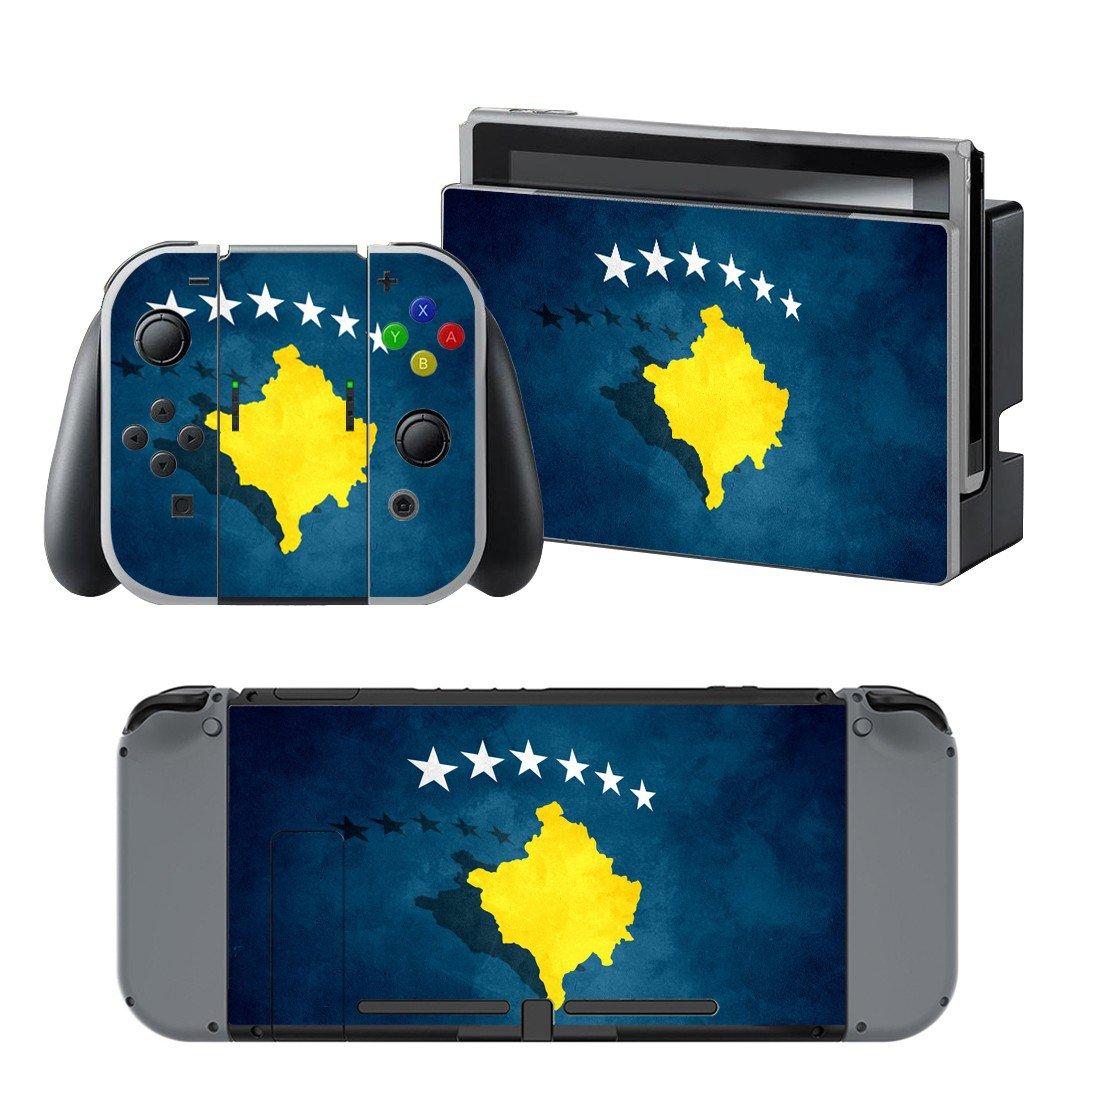 Kosovo flag design decal for Nintendo switch console sticker skin